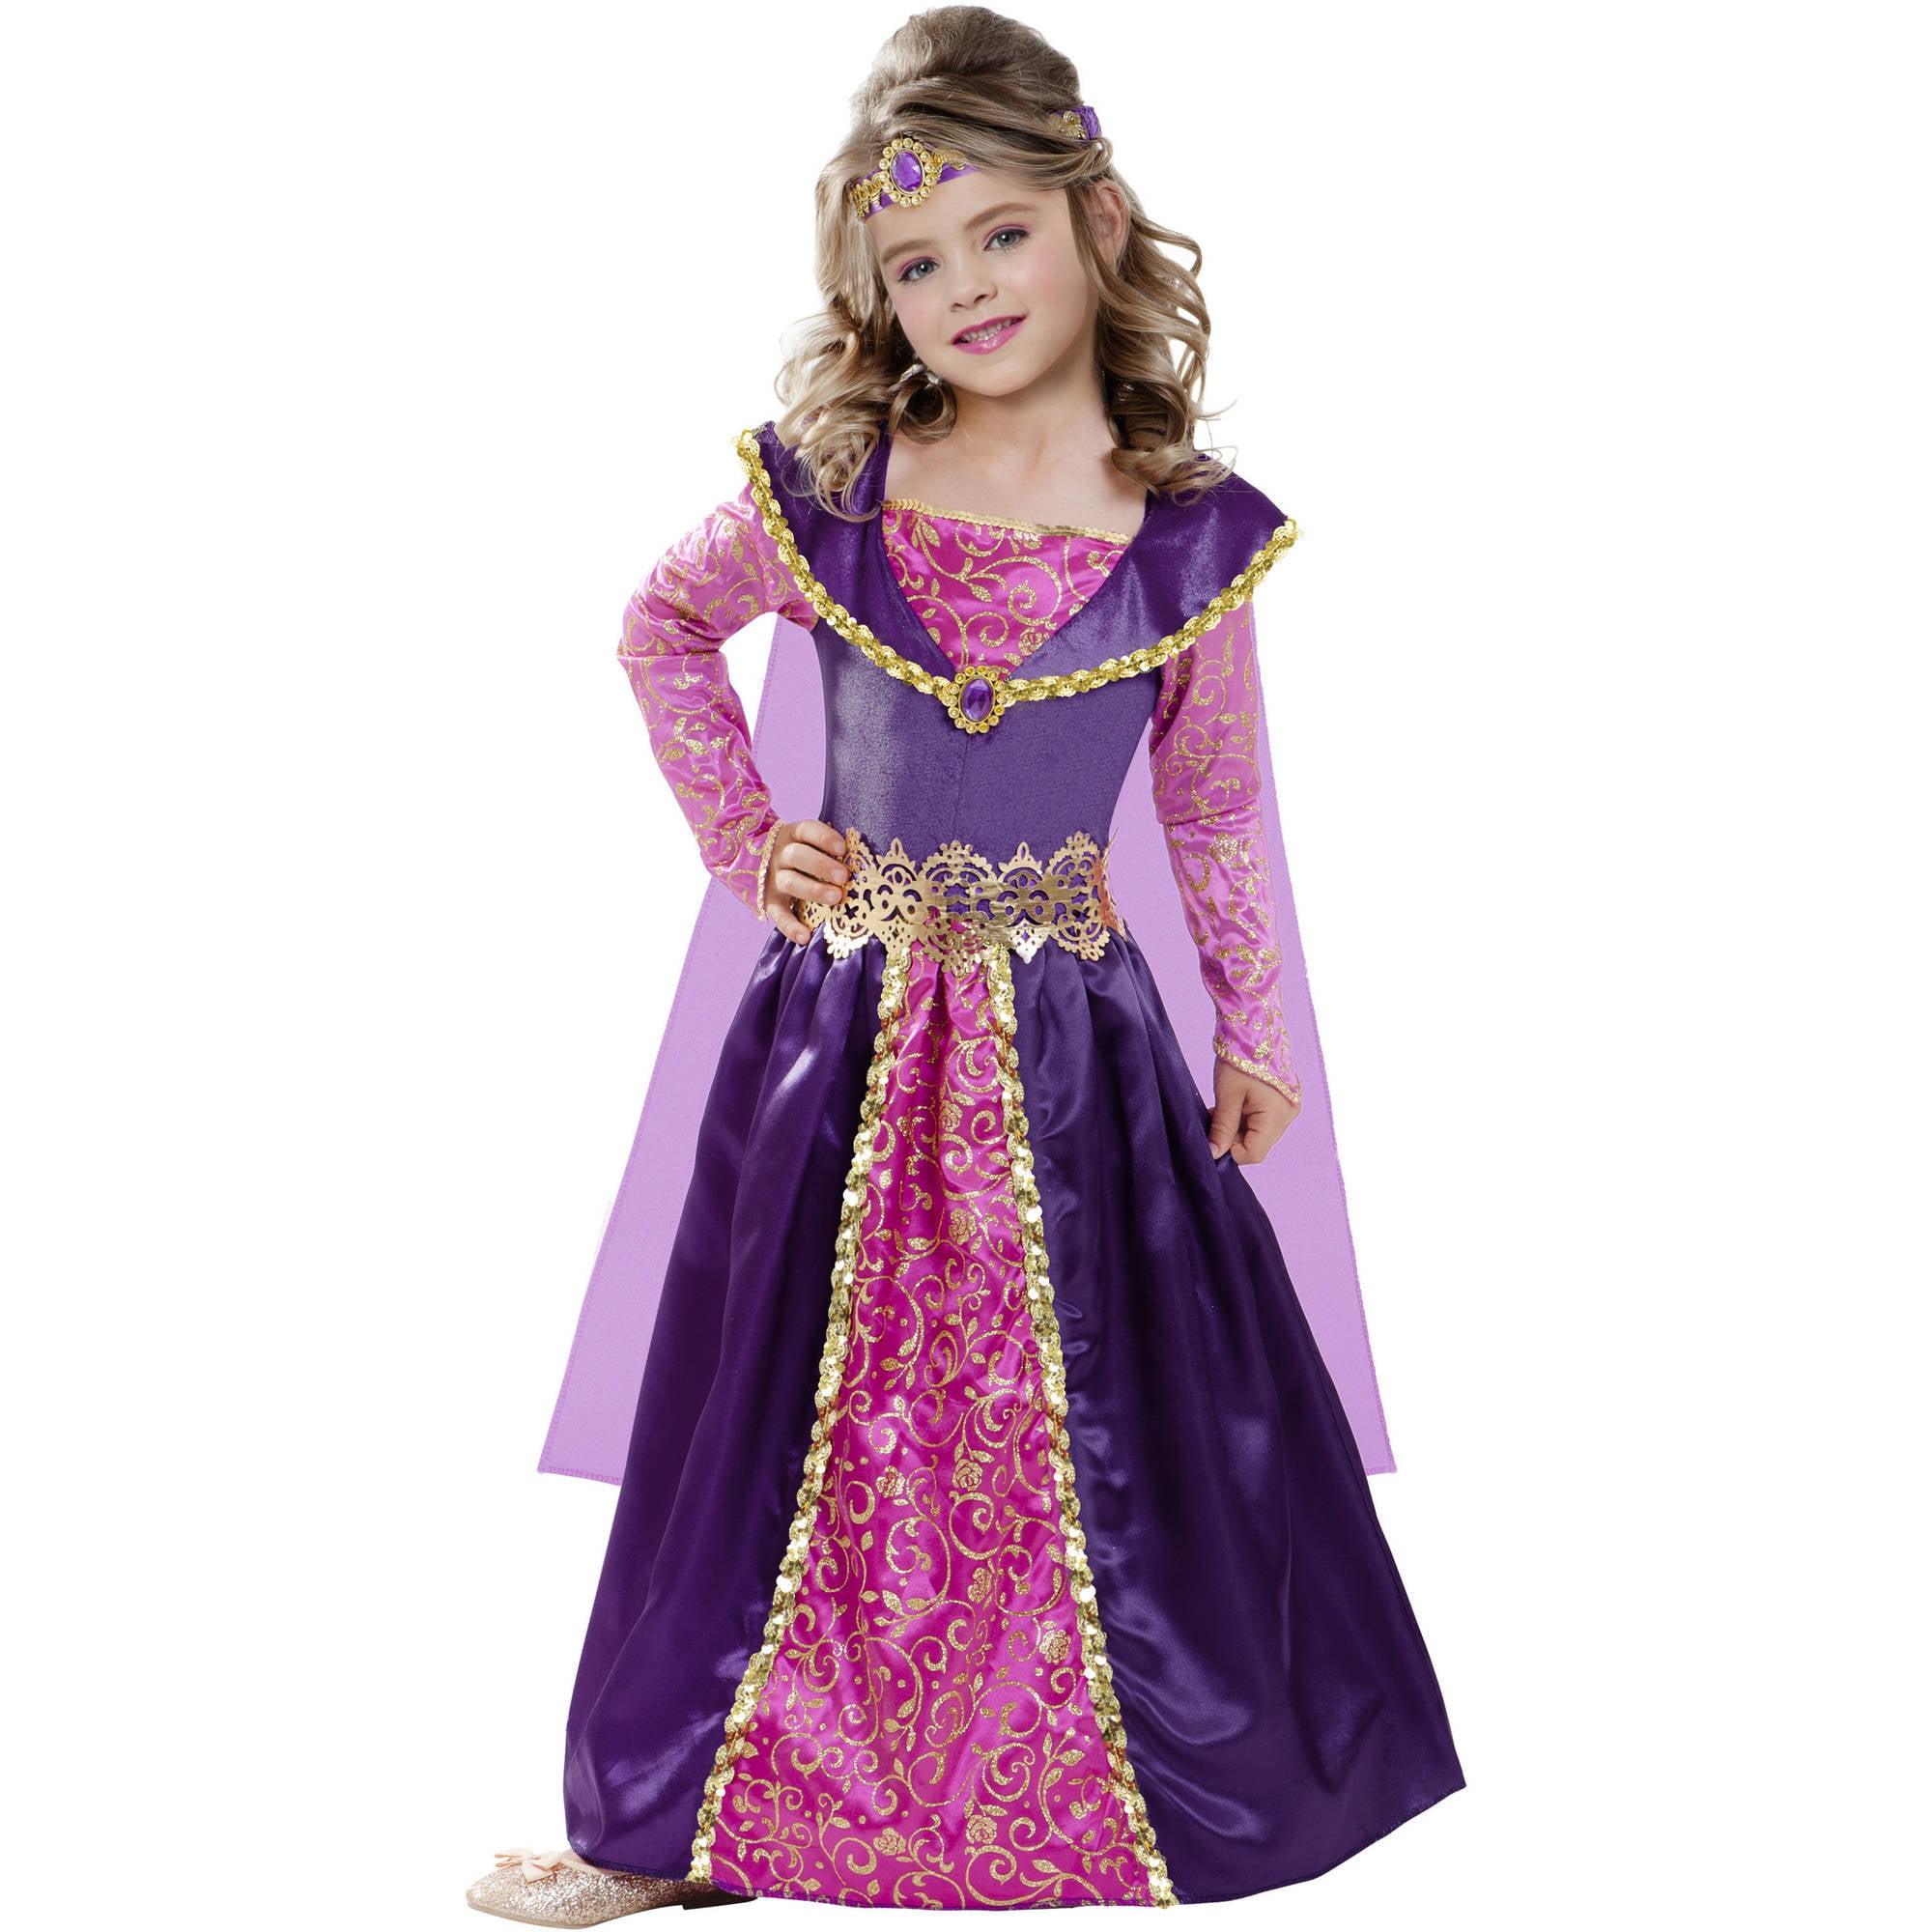 RISING28064685 Medieval Princess Child Halloween Costume